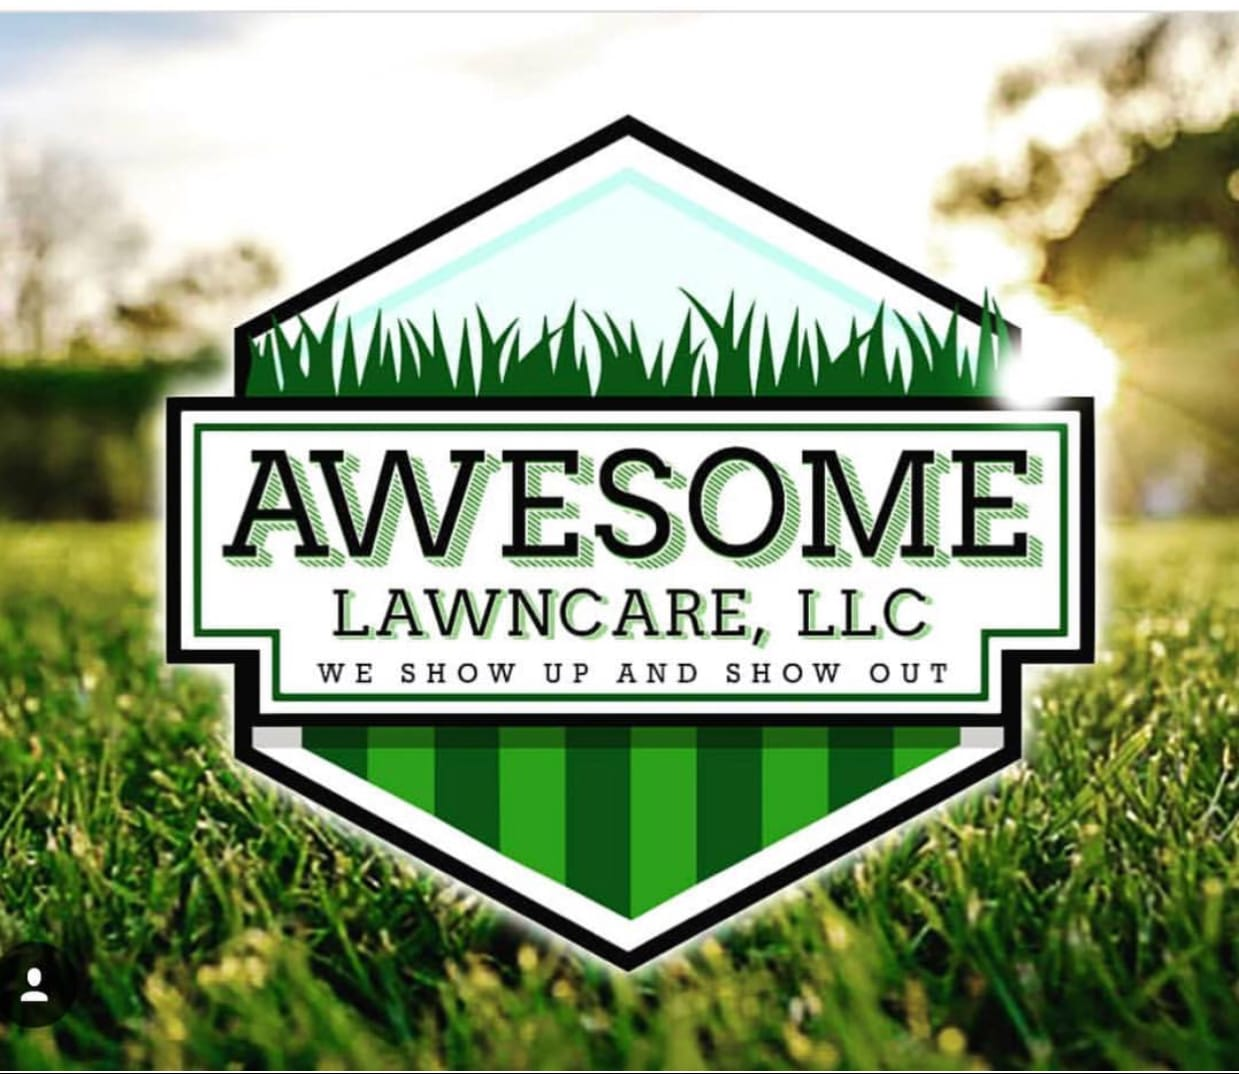 Awesome Lawncare LLC